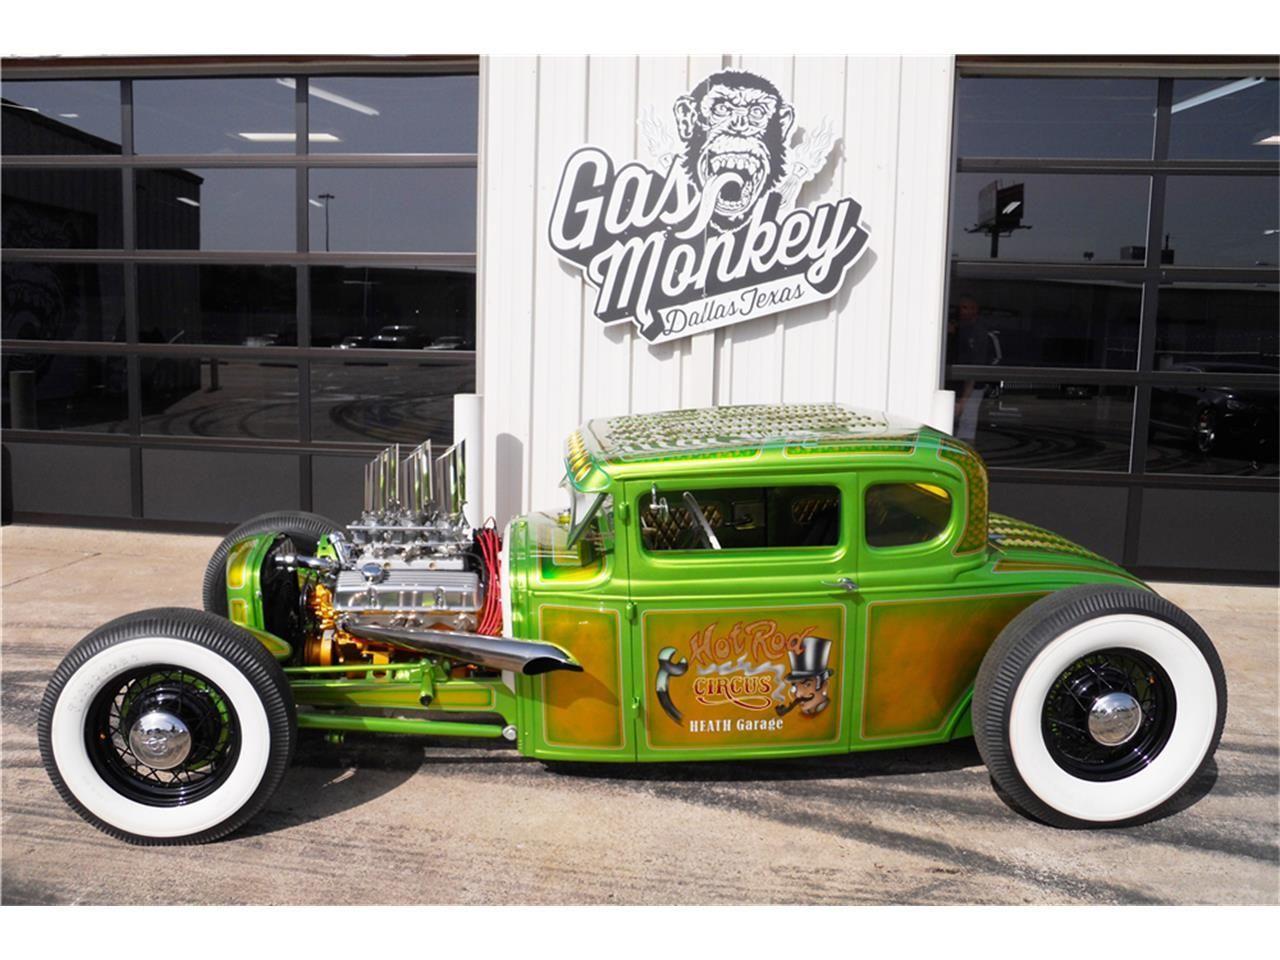 Gas Monkey Garage | Barrett-Jackson | ClassicCars.com #gasmonkeygarage Gas Monkey Garage | Barrett-Jackson | ClassicCars.com #gasmonkeygarage